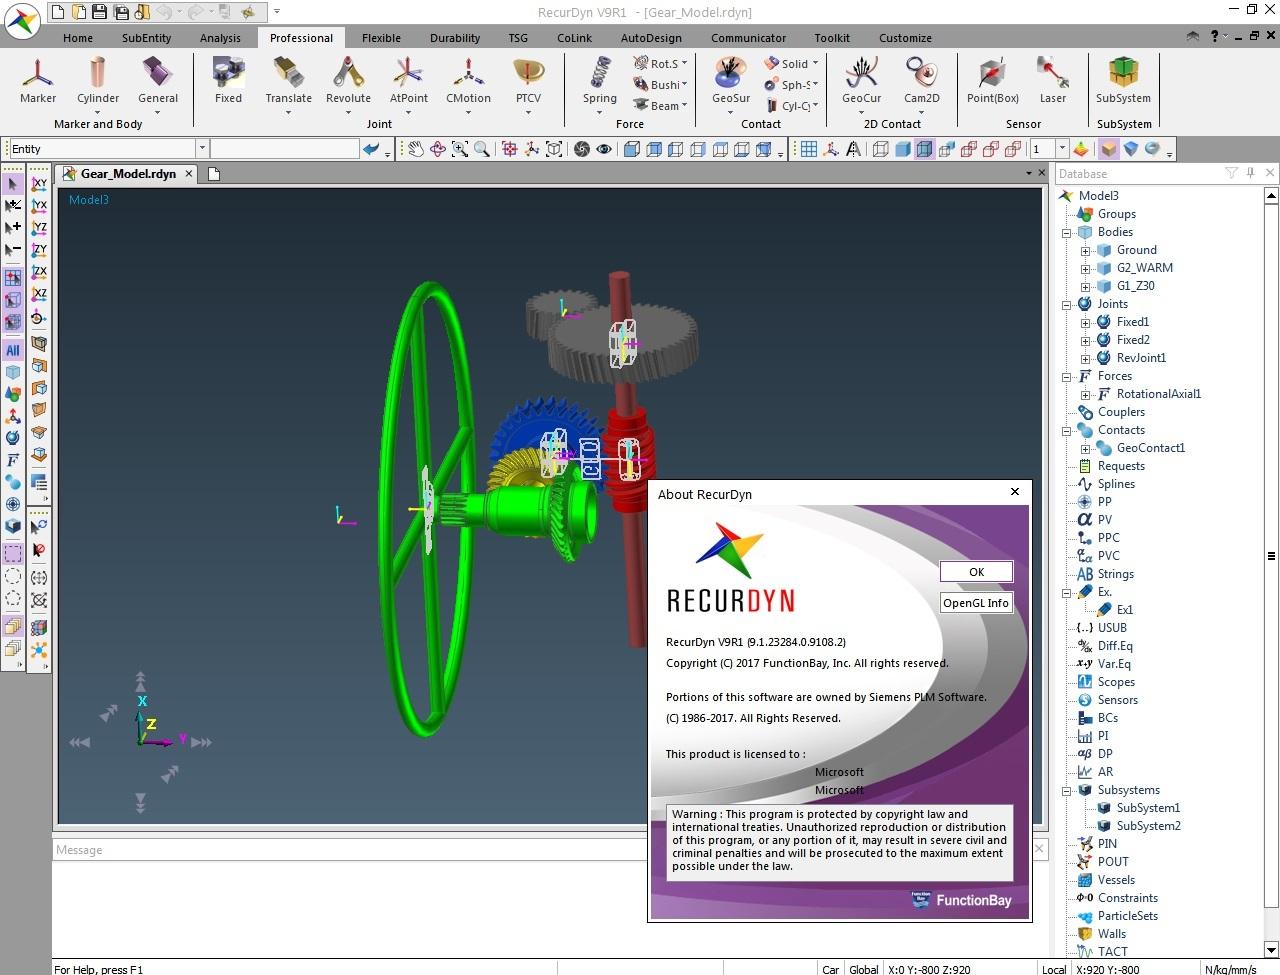 Working with FunctionBay RecurDyn V9R1 full license